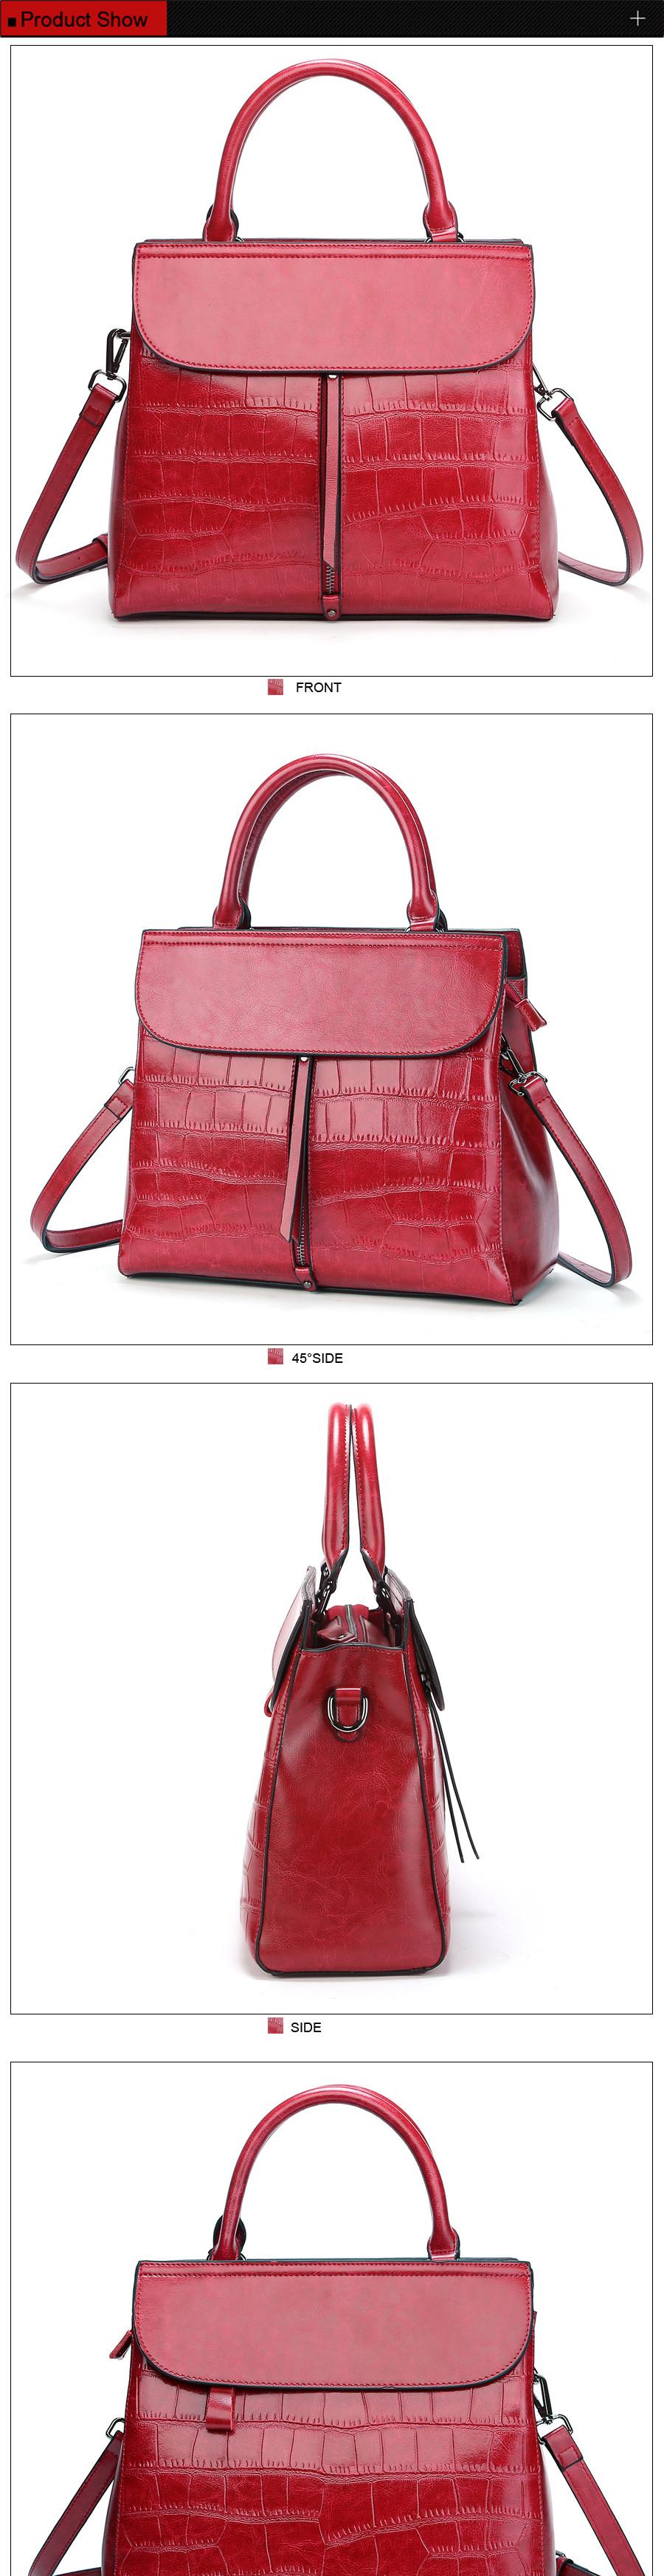 900woman-handbag3_01